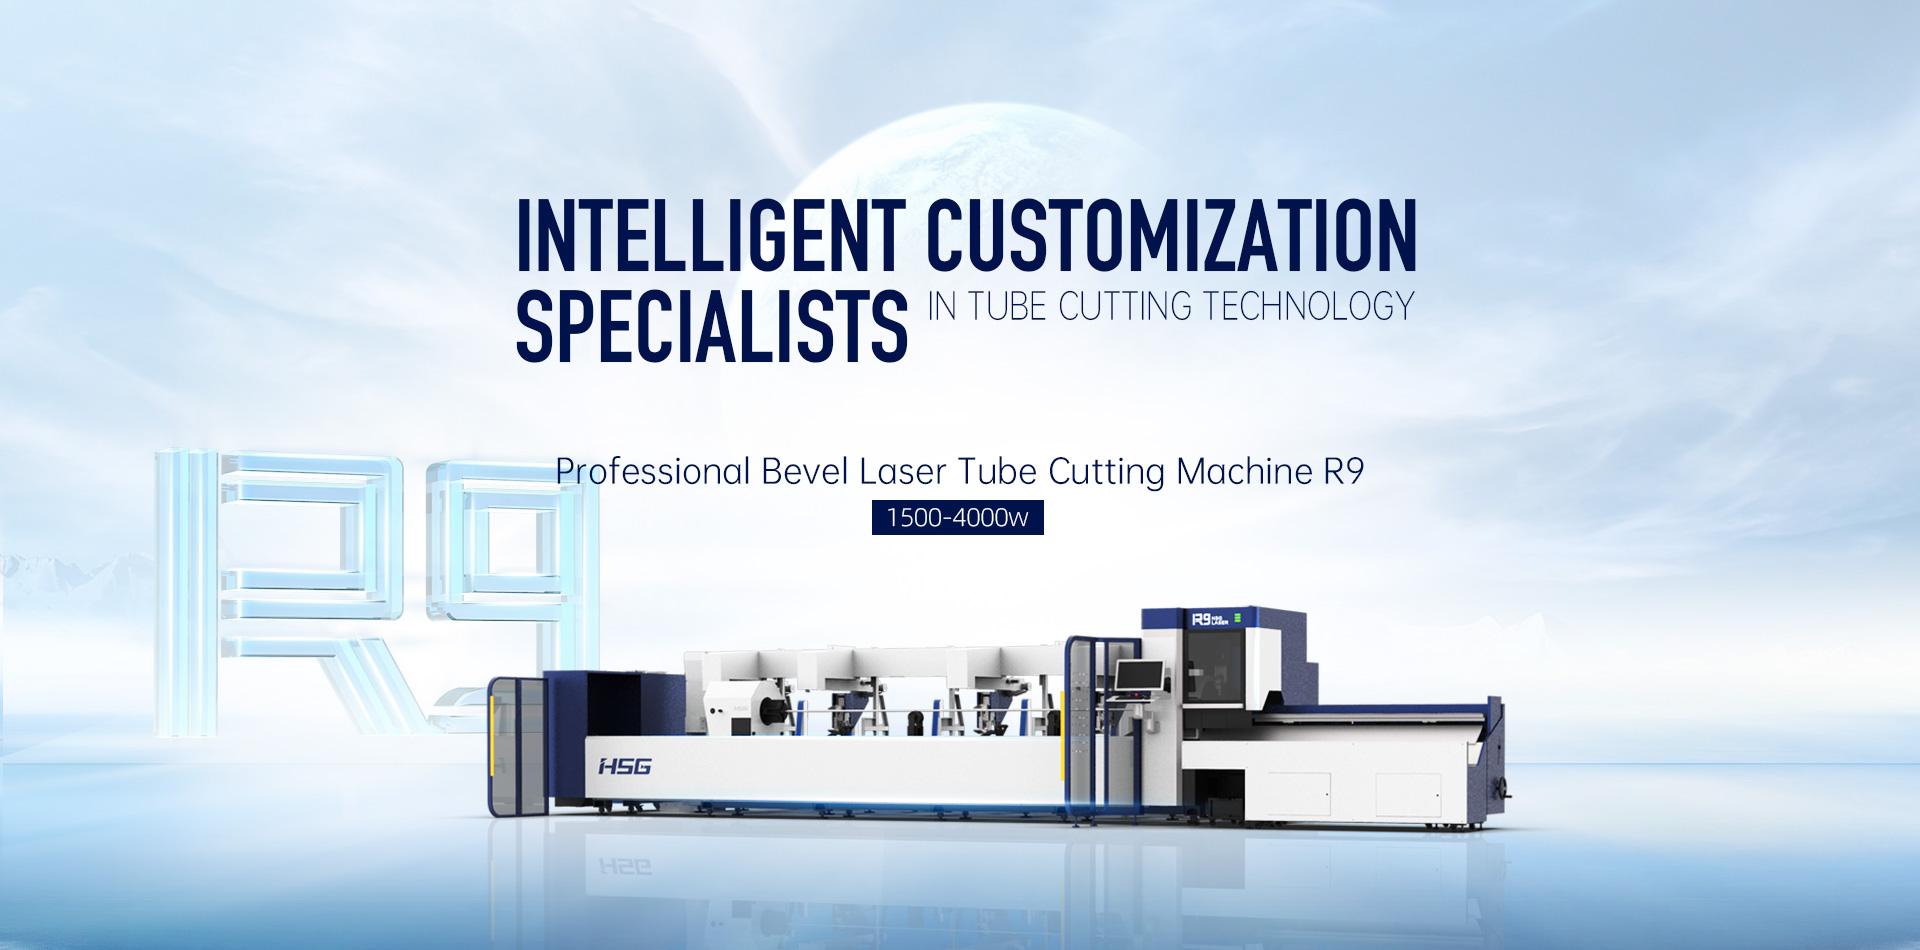 R9 Professional Bevel Laser Tube Cutting Machine